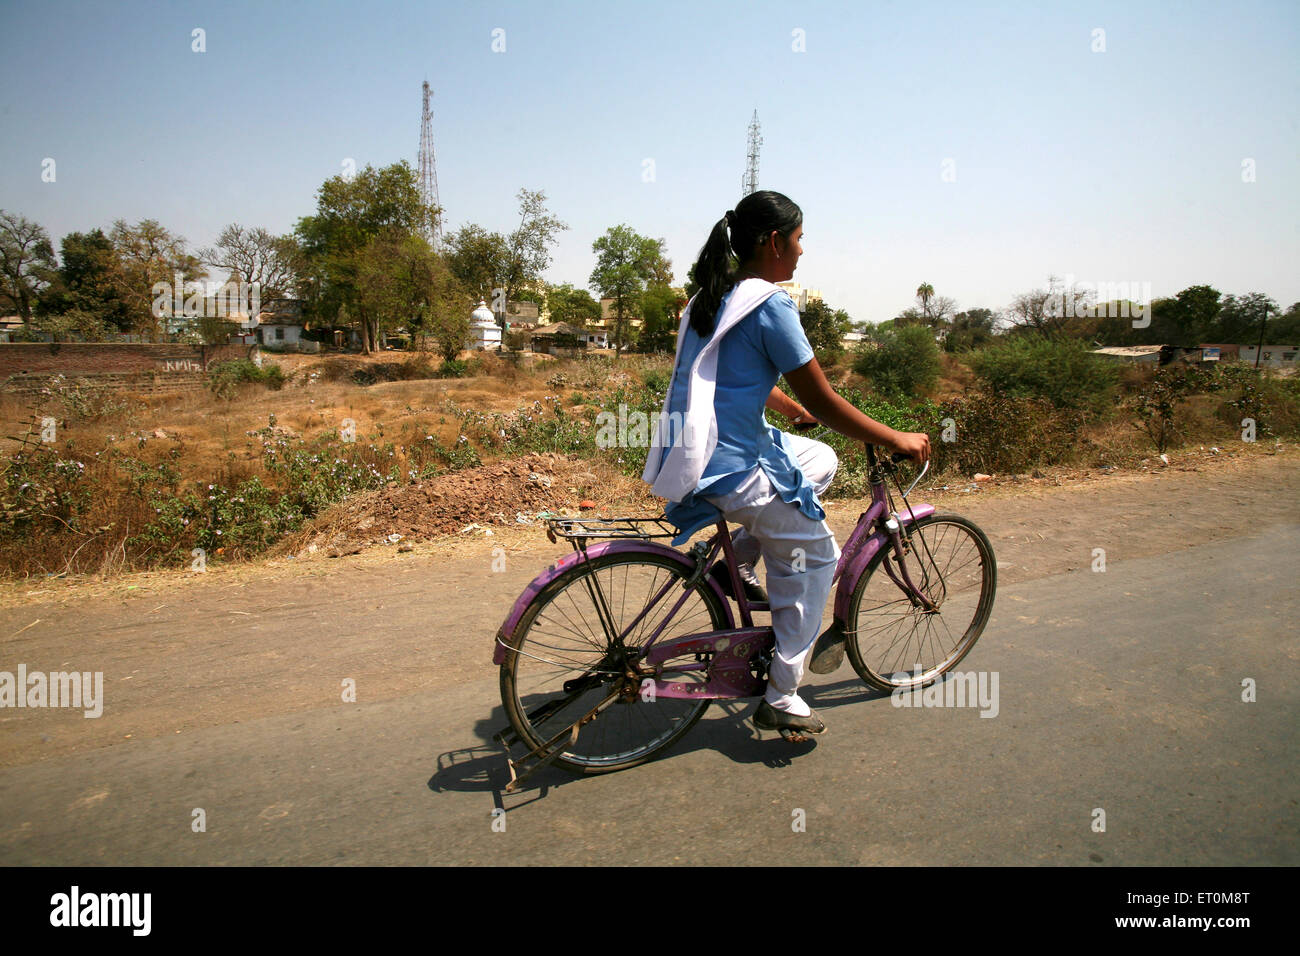 Young girl in salwar kameez with dupatta